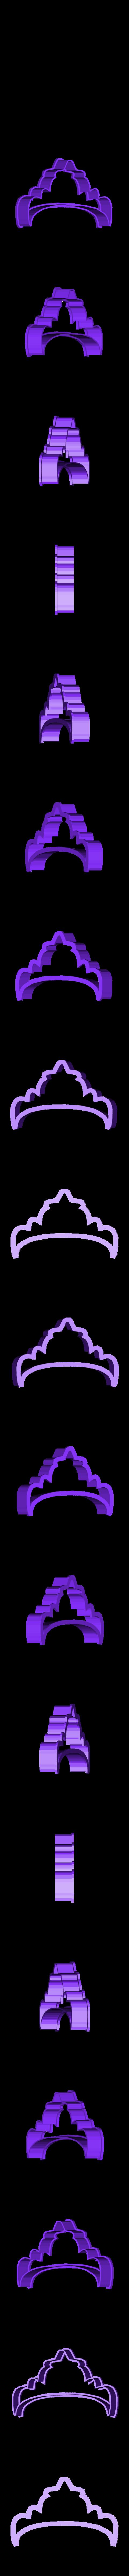 crown 4.stl Download STL file Crown cookie cutter set • 3D printer design, davidruizo